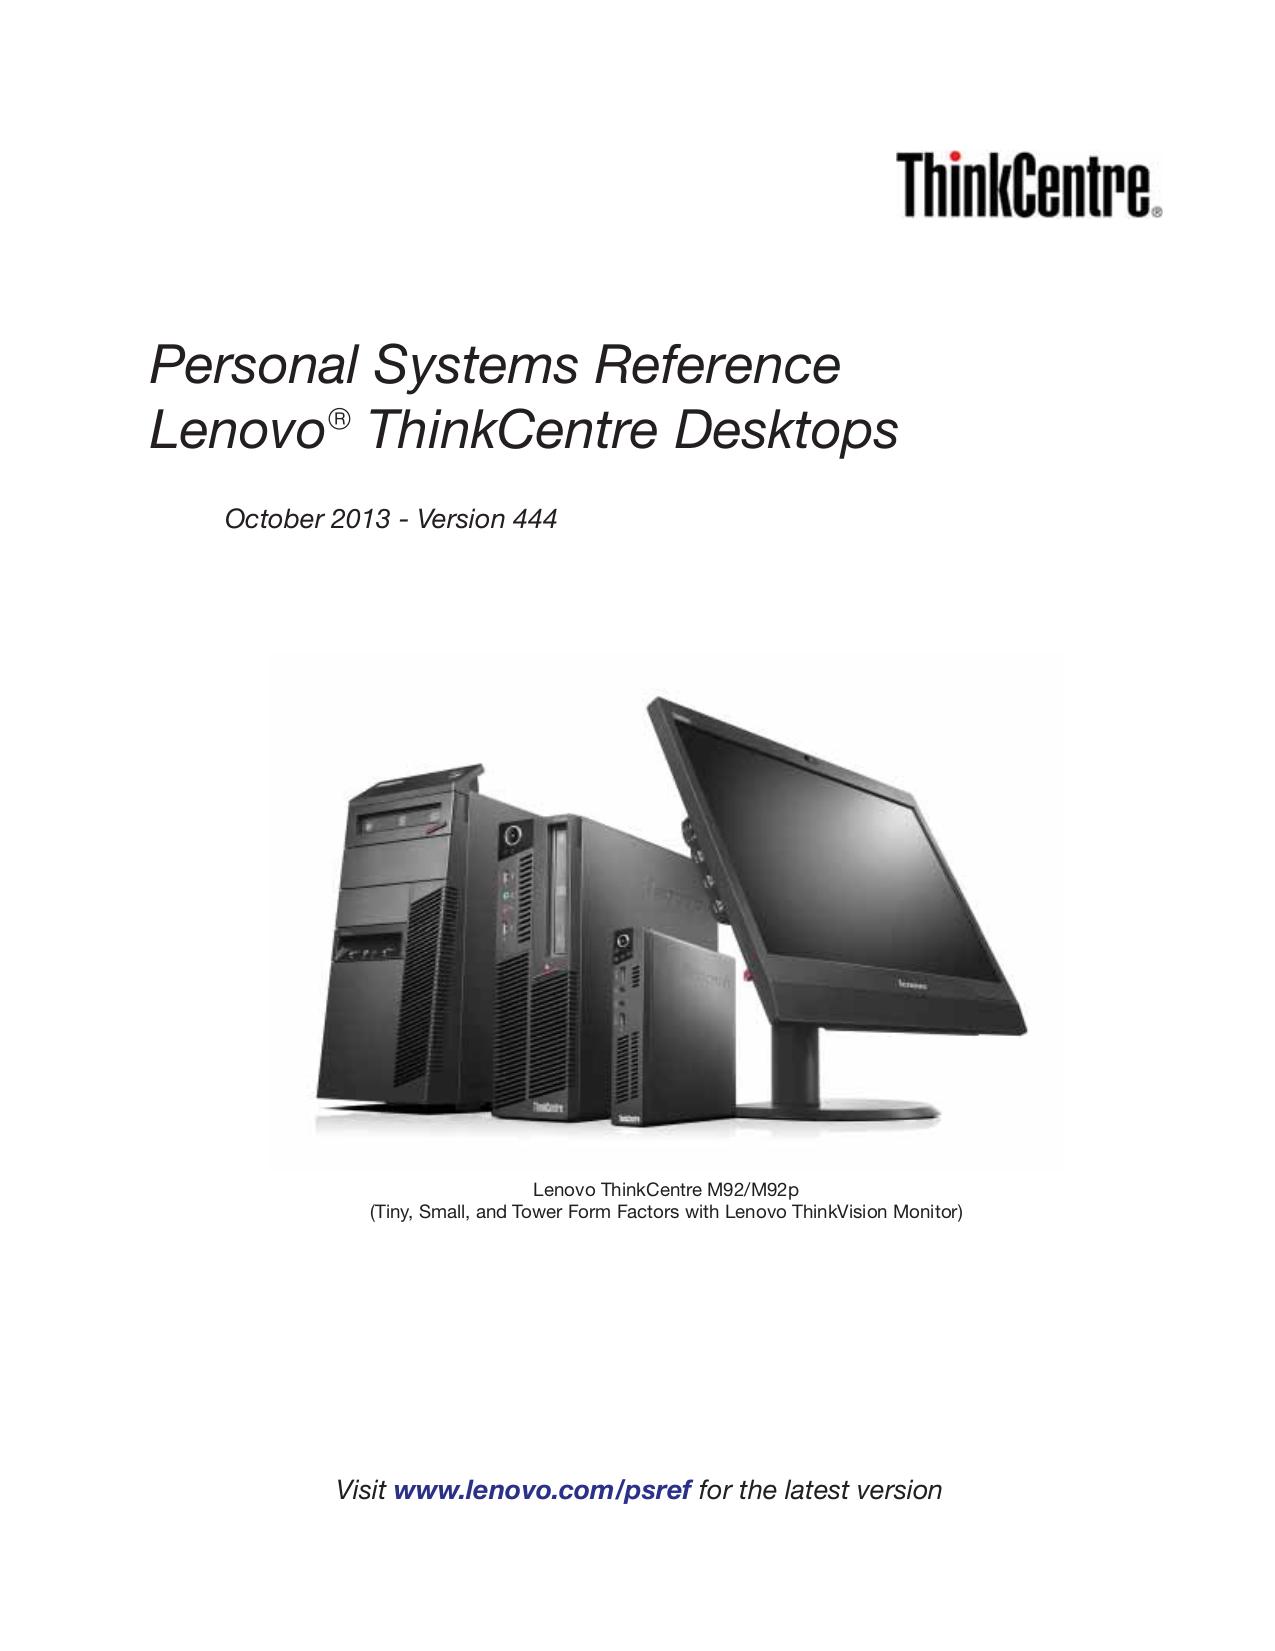 pdf for Lenovo Desktop ThinkCentre M81 5030 manual